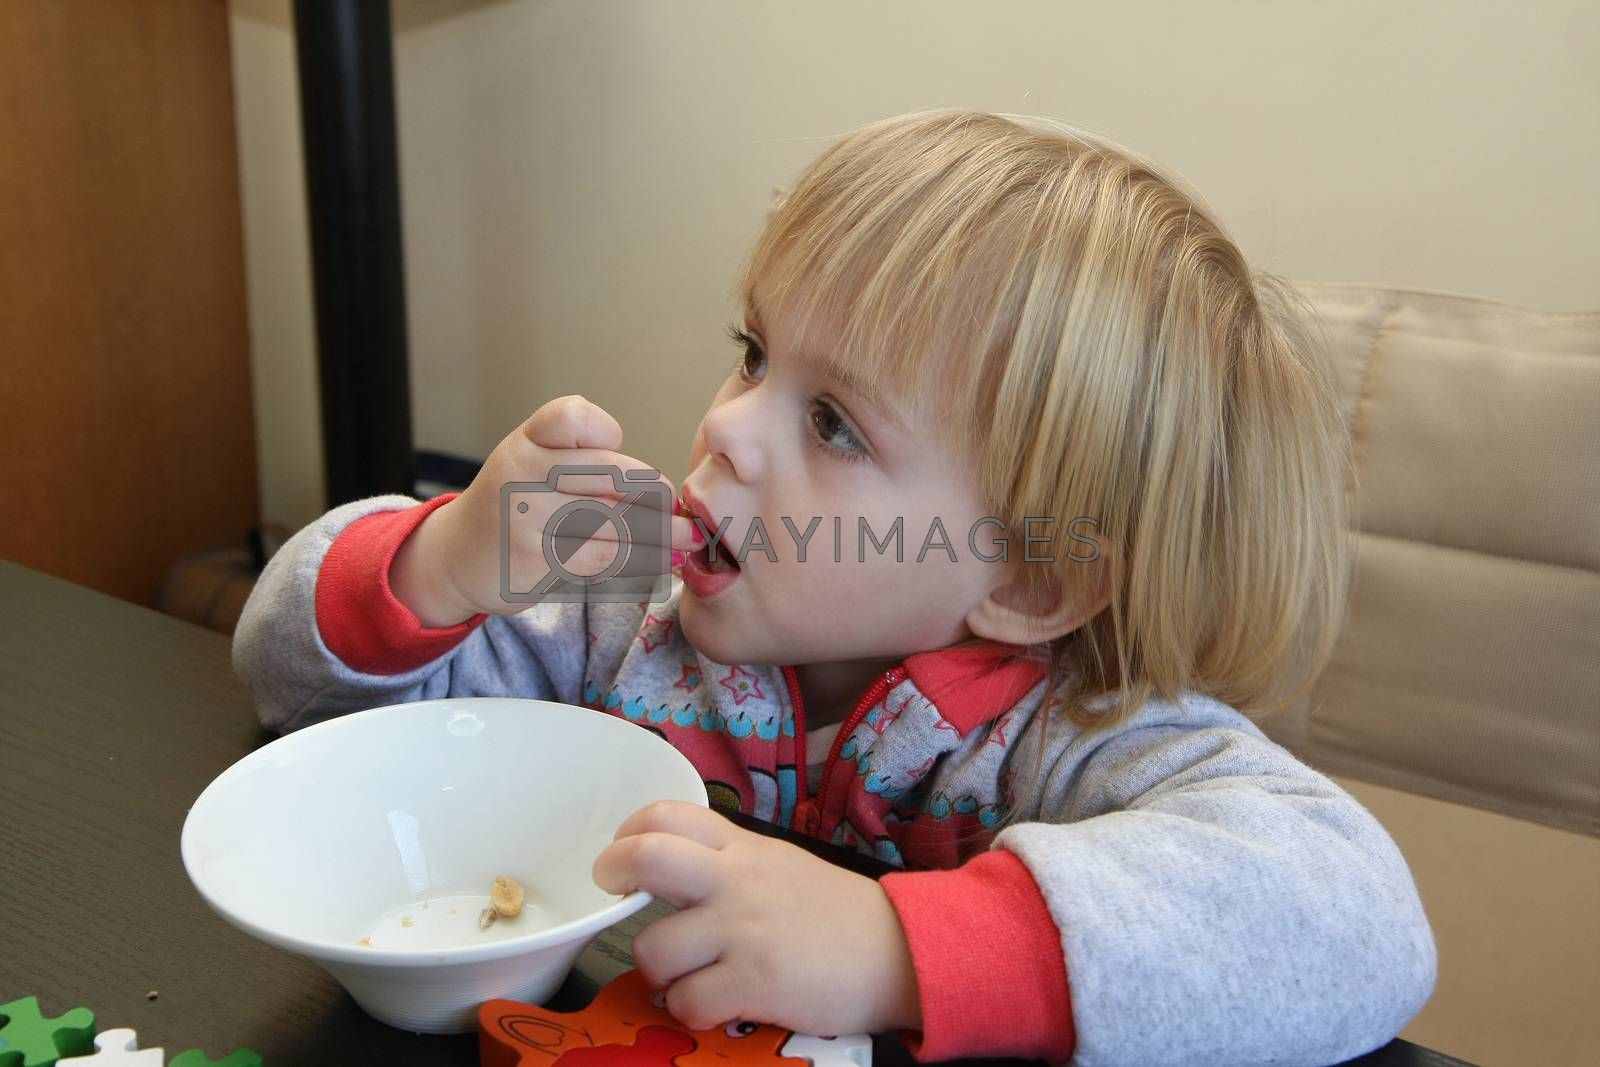 Young girl enjoys eating peanuts